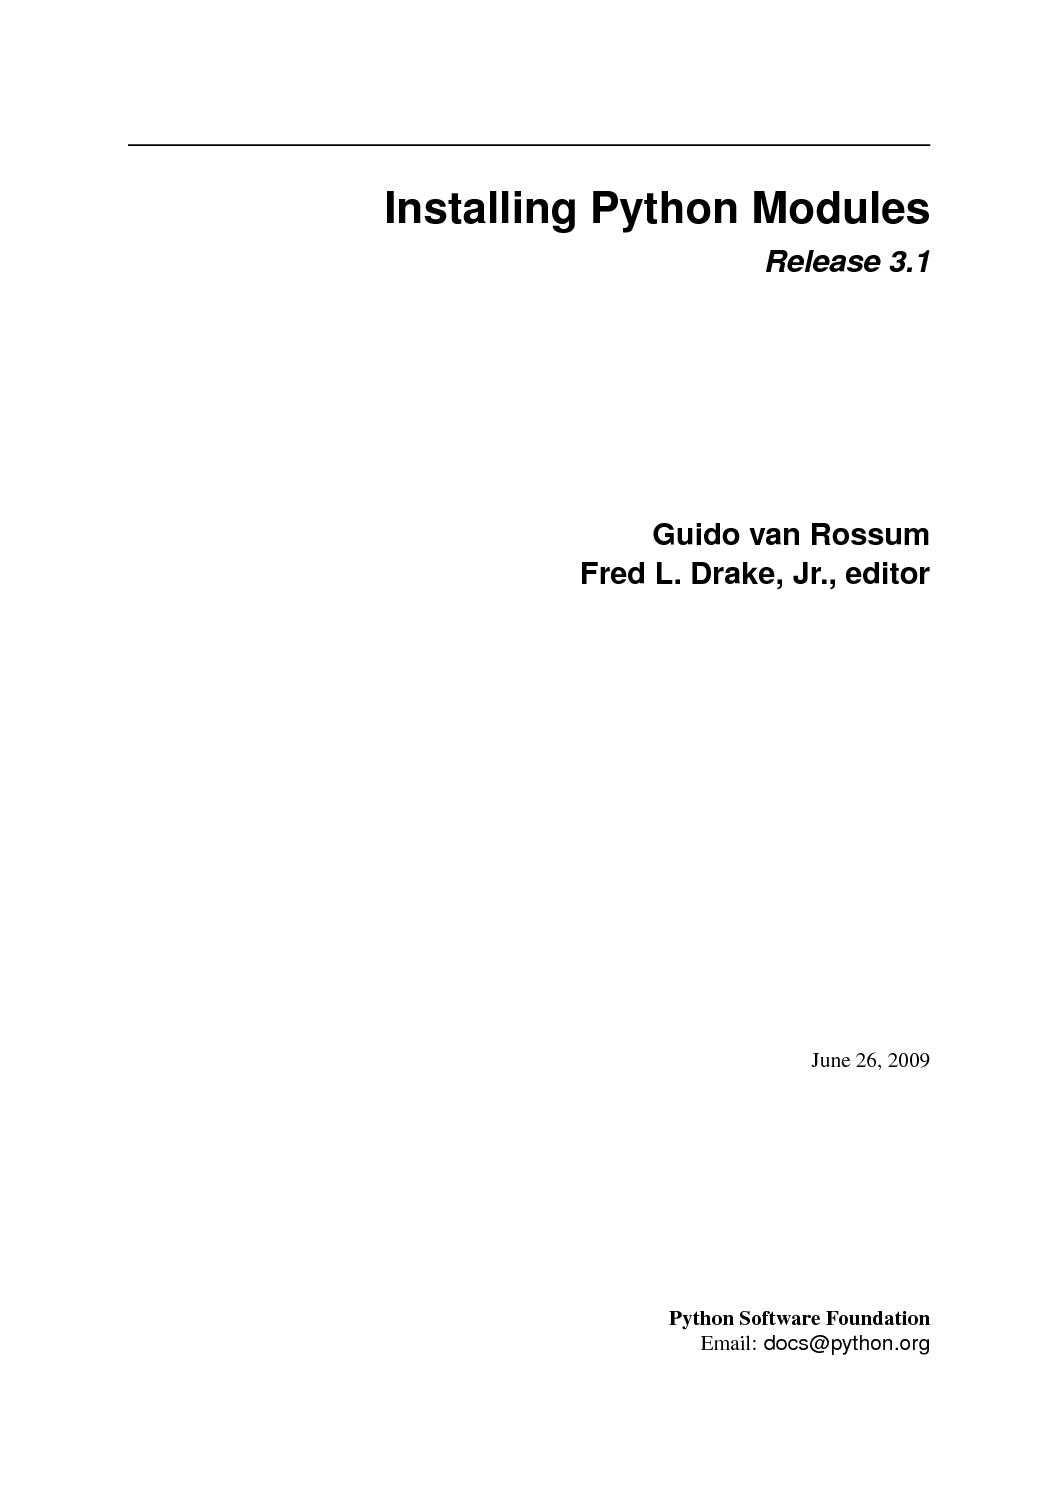 Python distutils install scripts